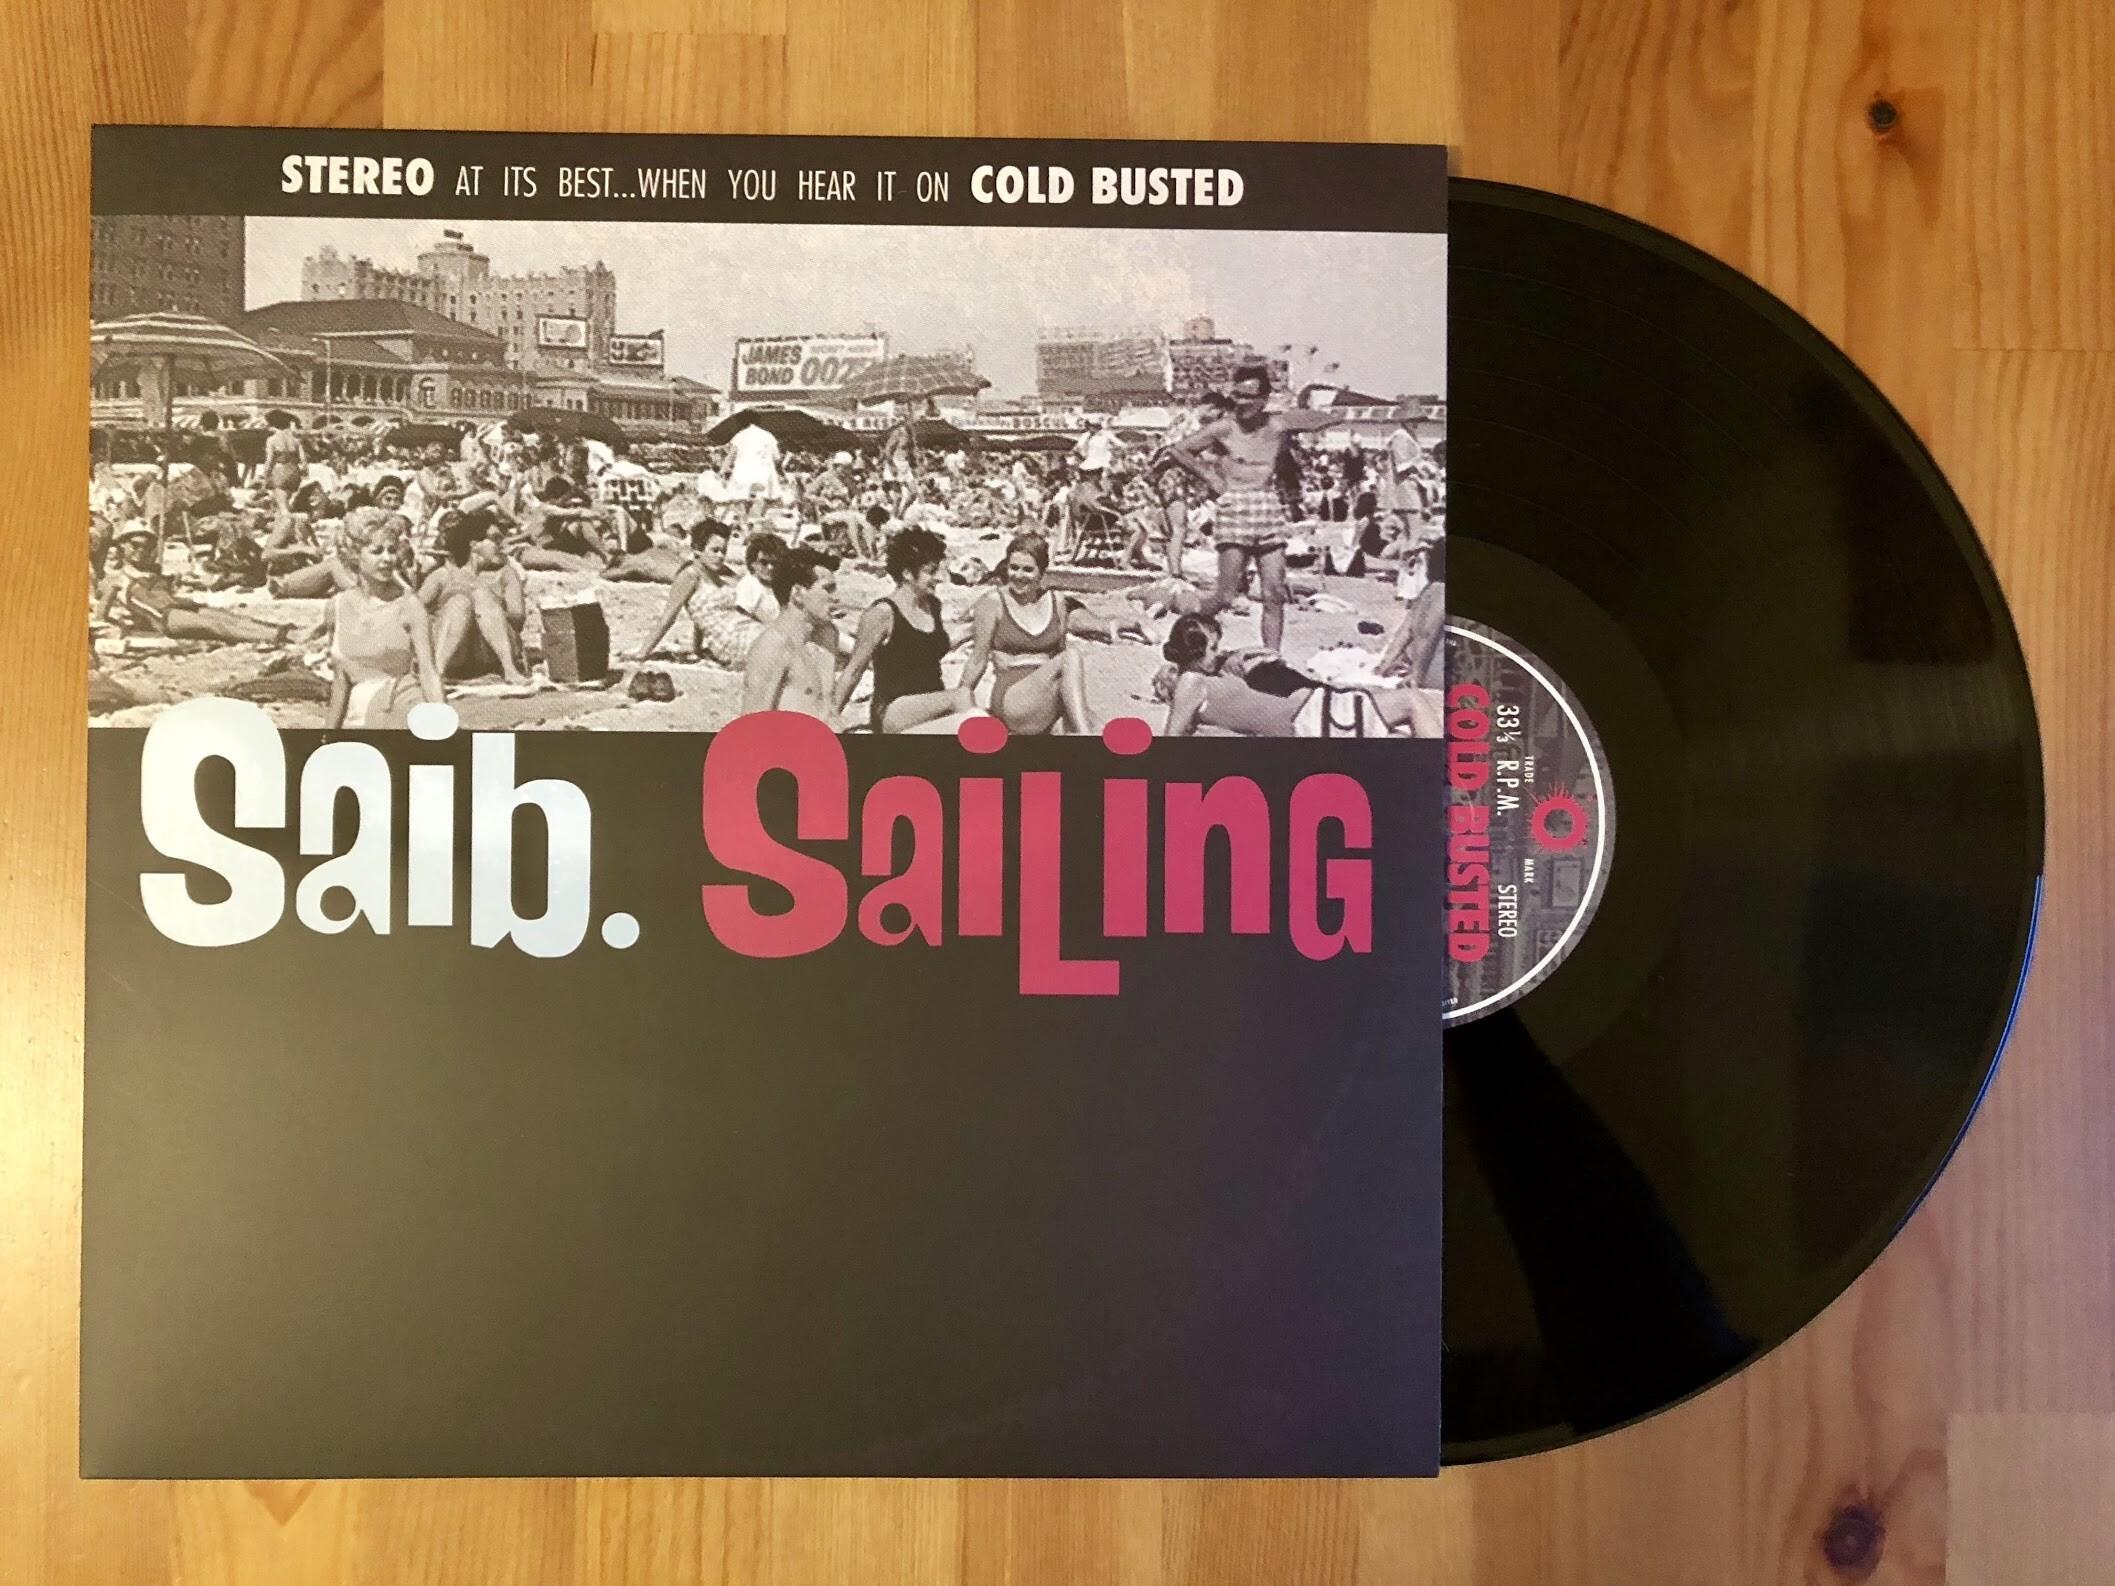 saib. - Sailing - Cold Busted